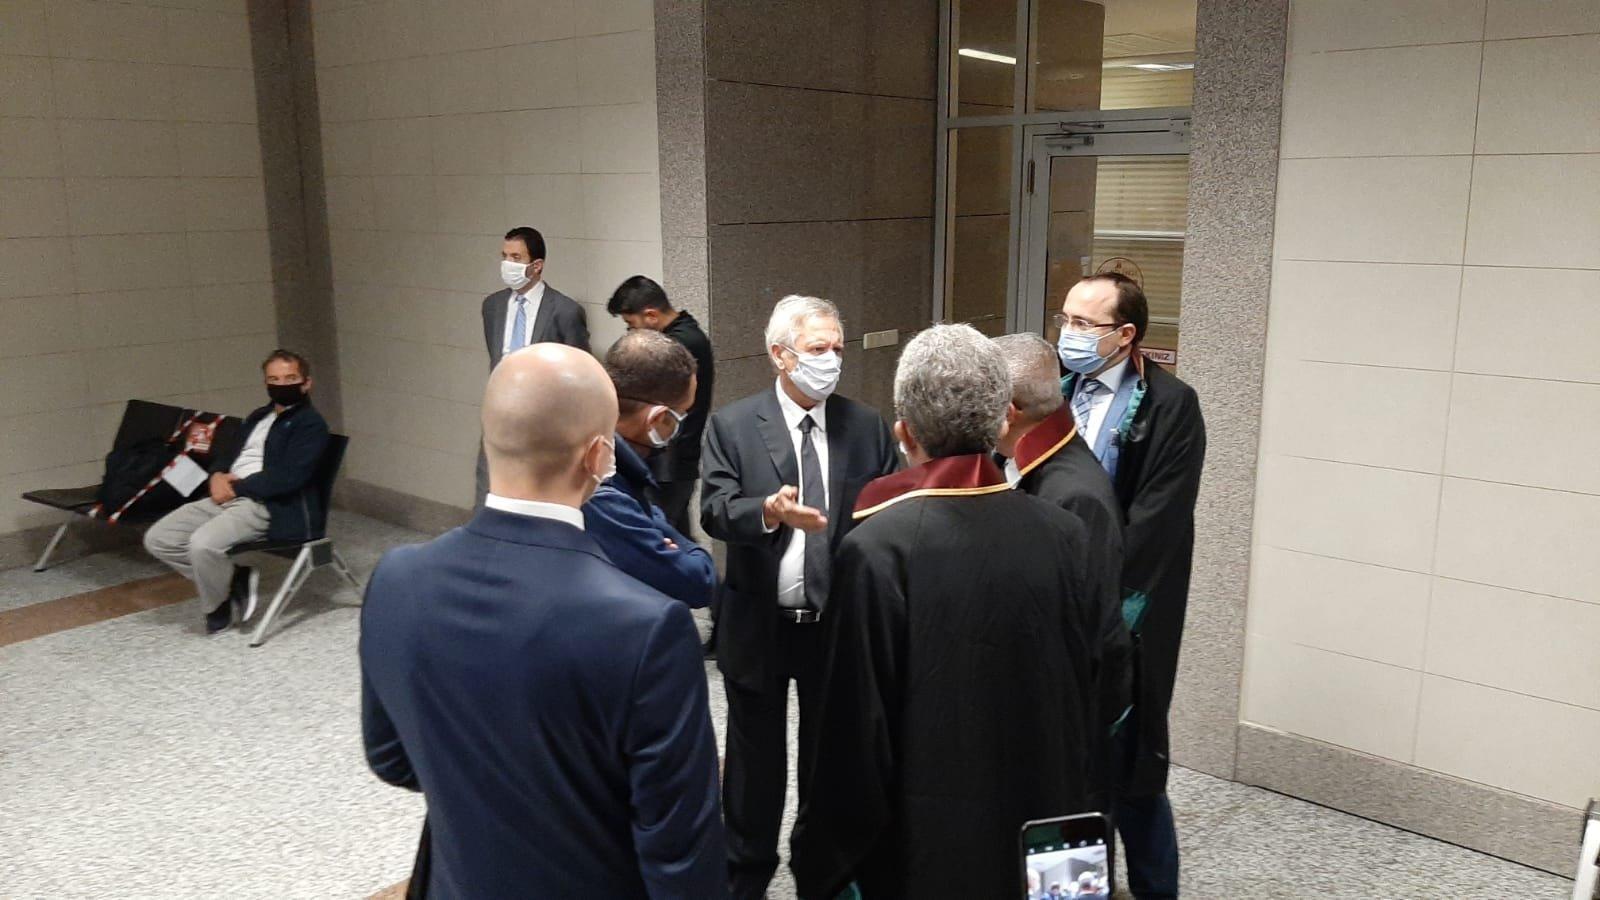 Aziz Yıldırım (C) outside the courtroom before the hearing, in Istanbul, Turkey, Nov. 6, 2020. (DHA Photo)